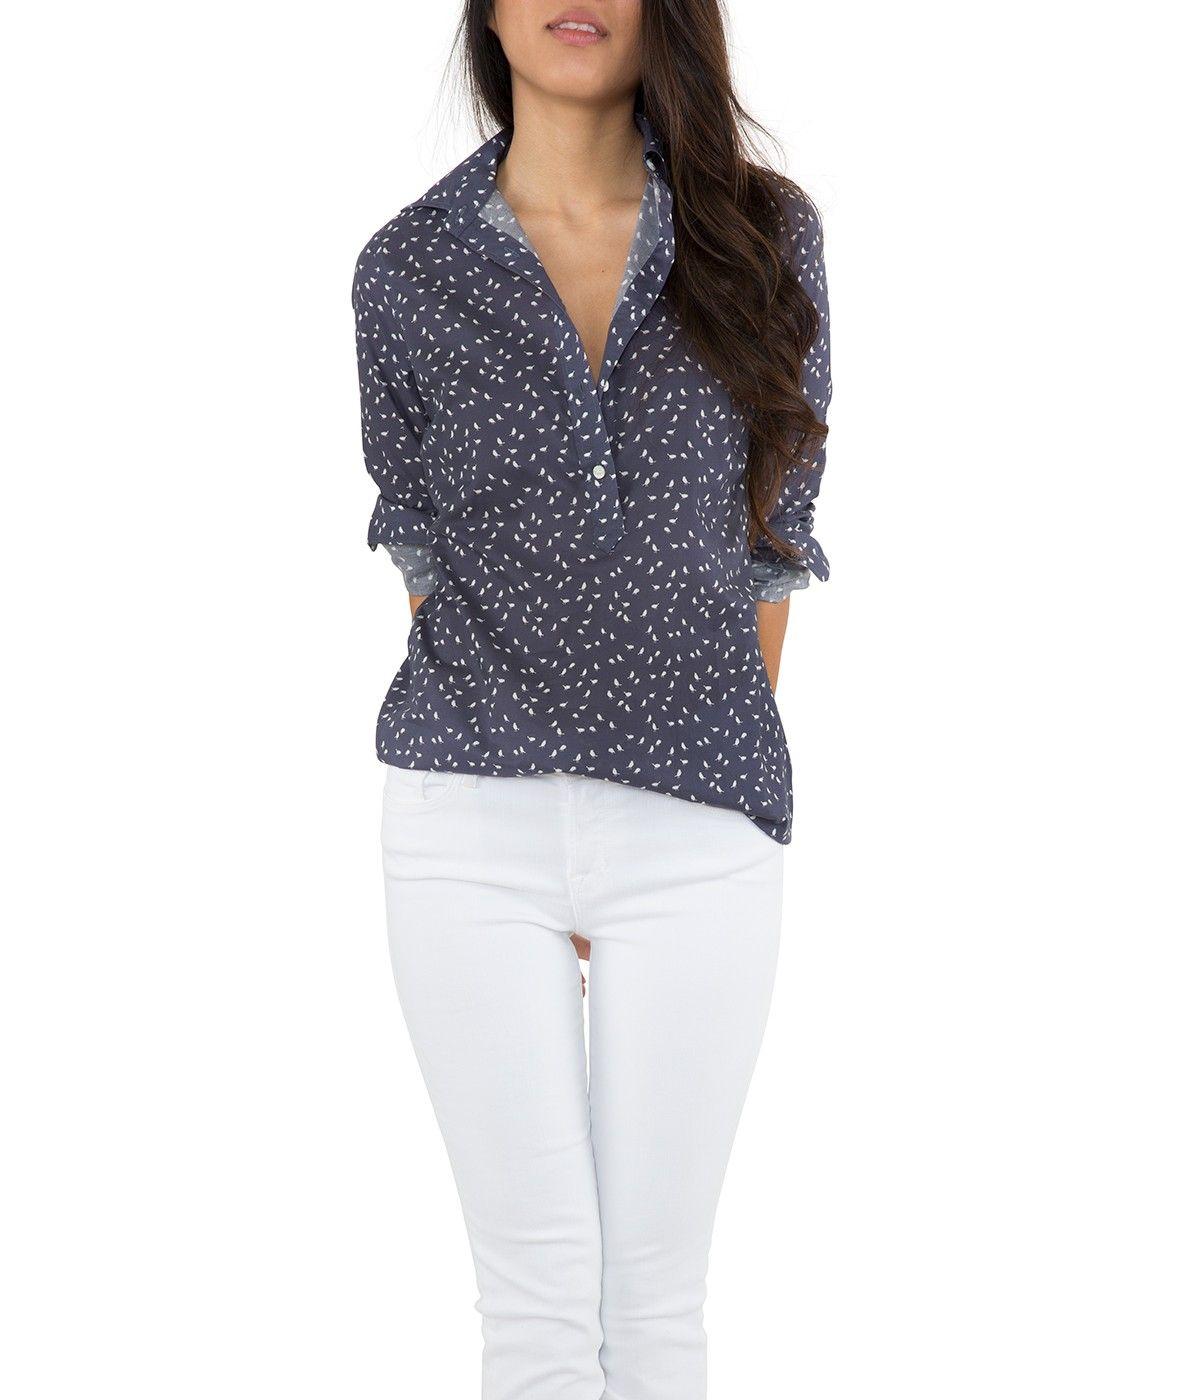 Ann Mashburn Tomboy Popover Shirt / AnnMashburn.com